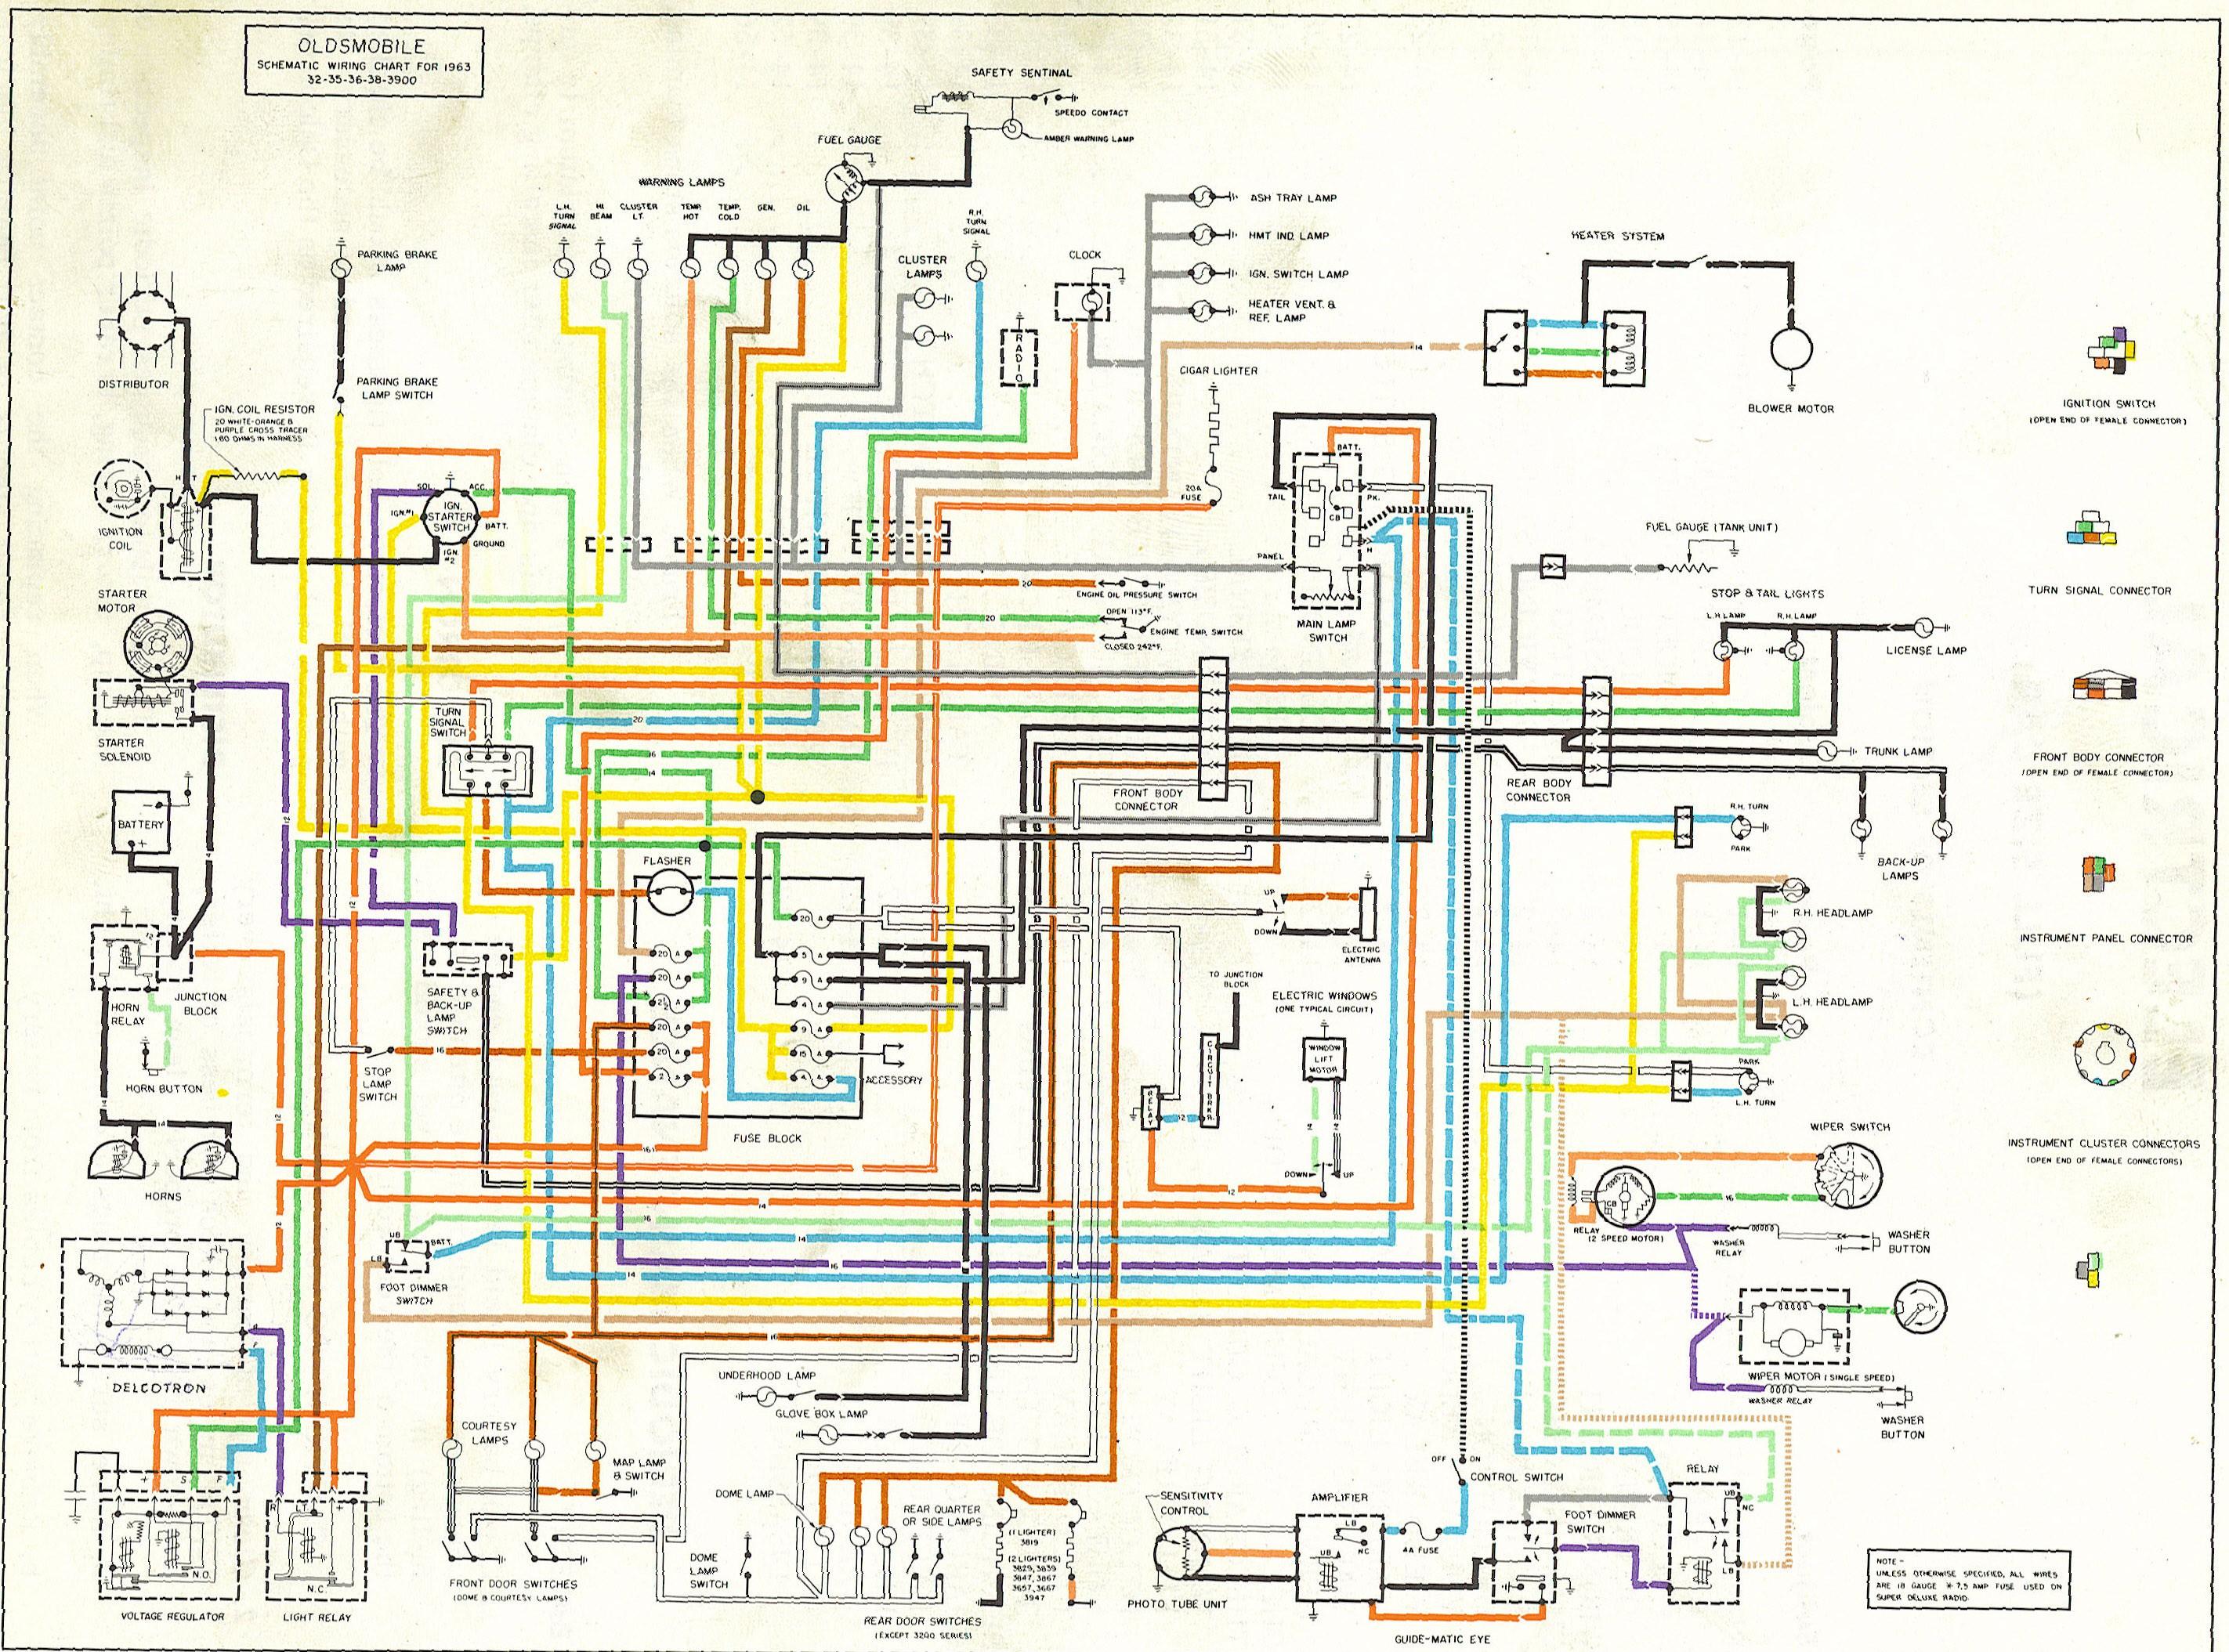 2001 Oldsmobile Aurora Engine Diagram Oldsmobile Aurora Radio Wiring Diagram Worksheet and Wiring Diagram • Of 2001 Oldsmobile Aurora Engine Diagram